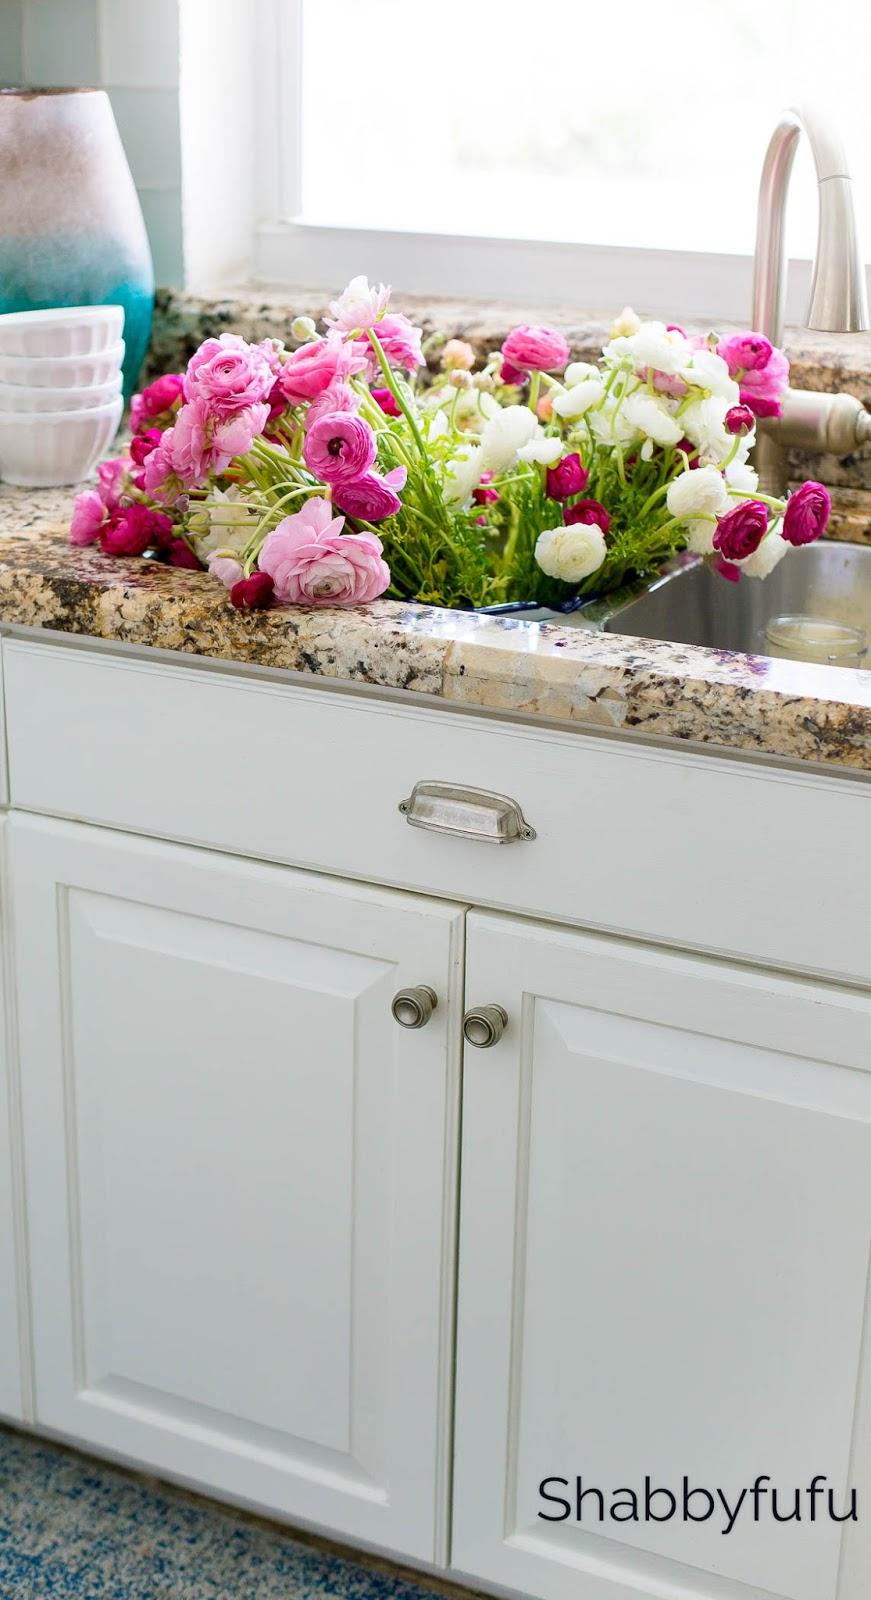 kitchen-sink-flowers-ranunculus-shabbyfufu